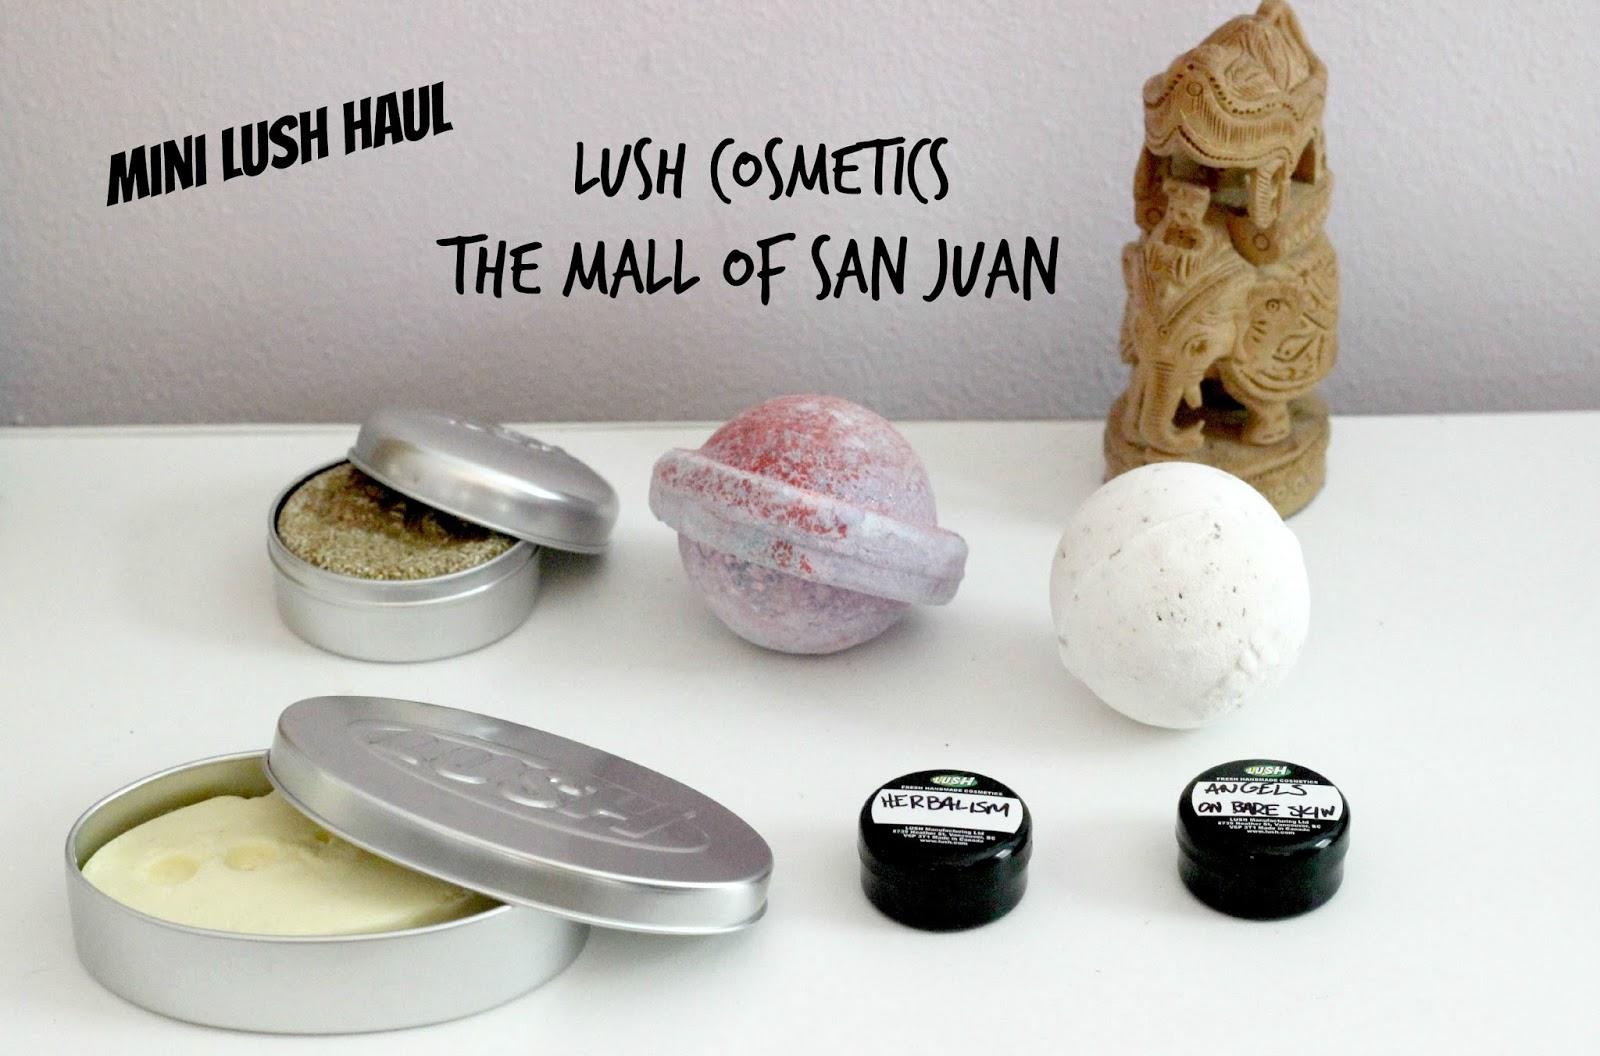 Mini Lush Haul Mall of San Juan - Unique fashion by Taryn